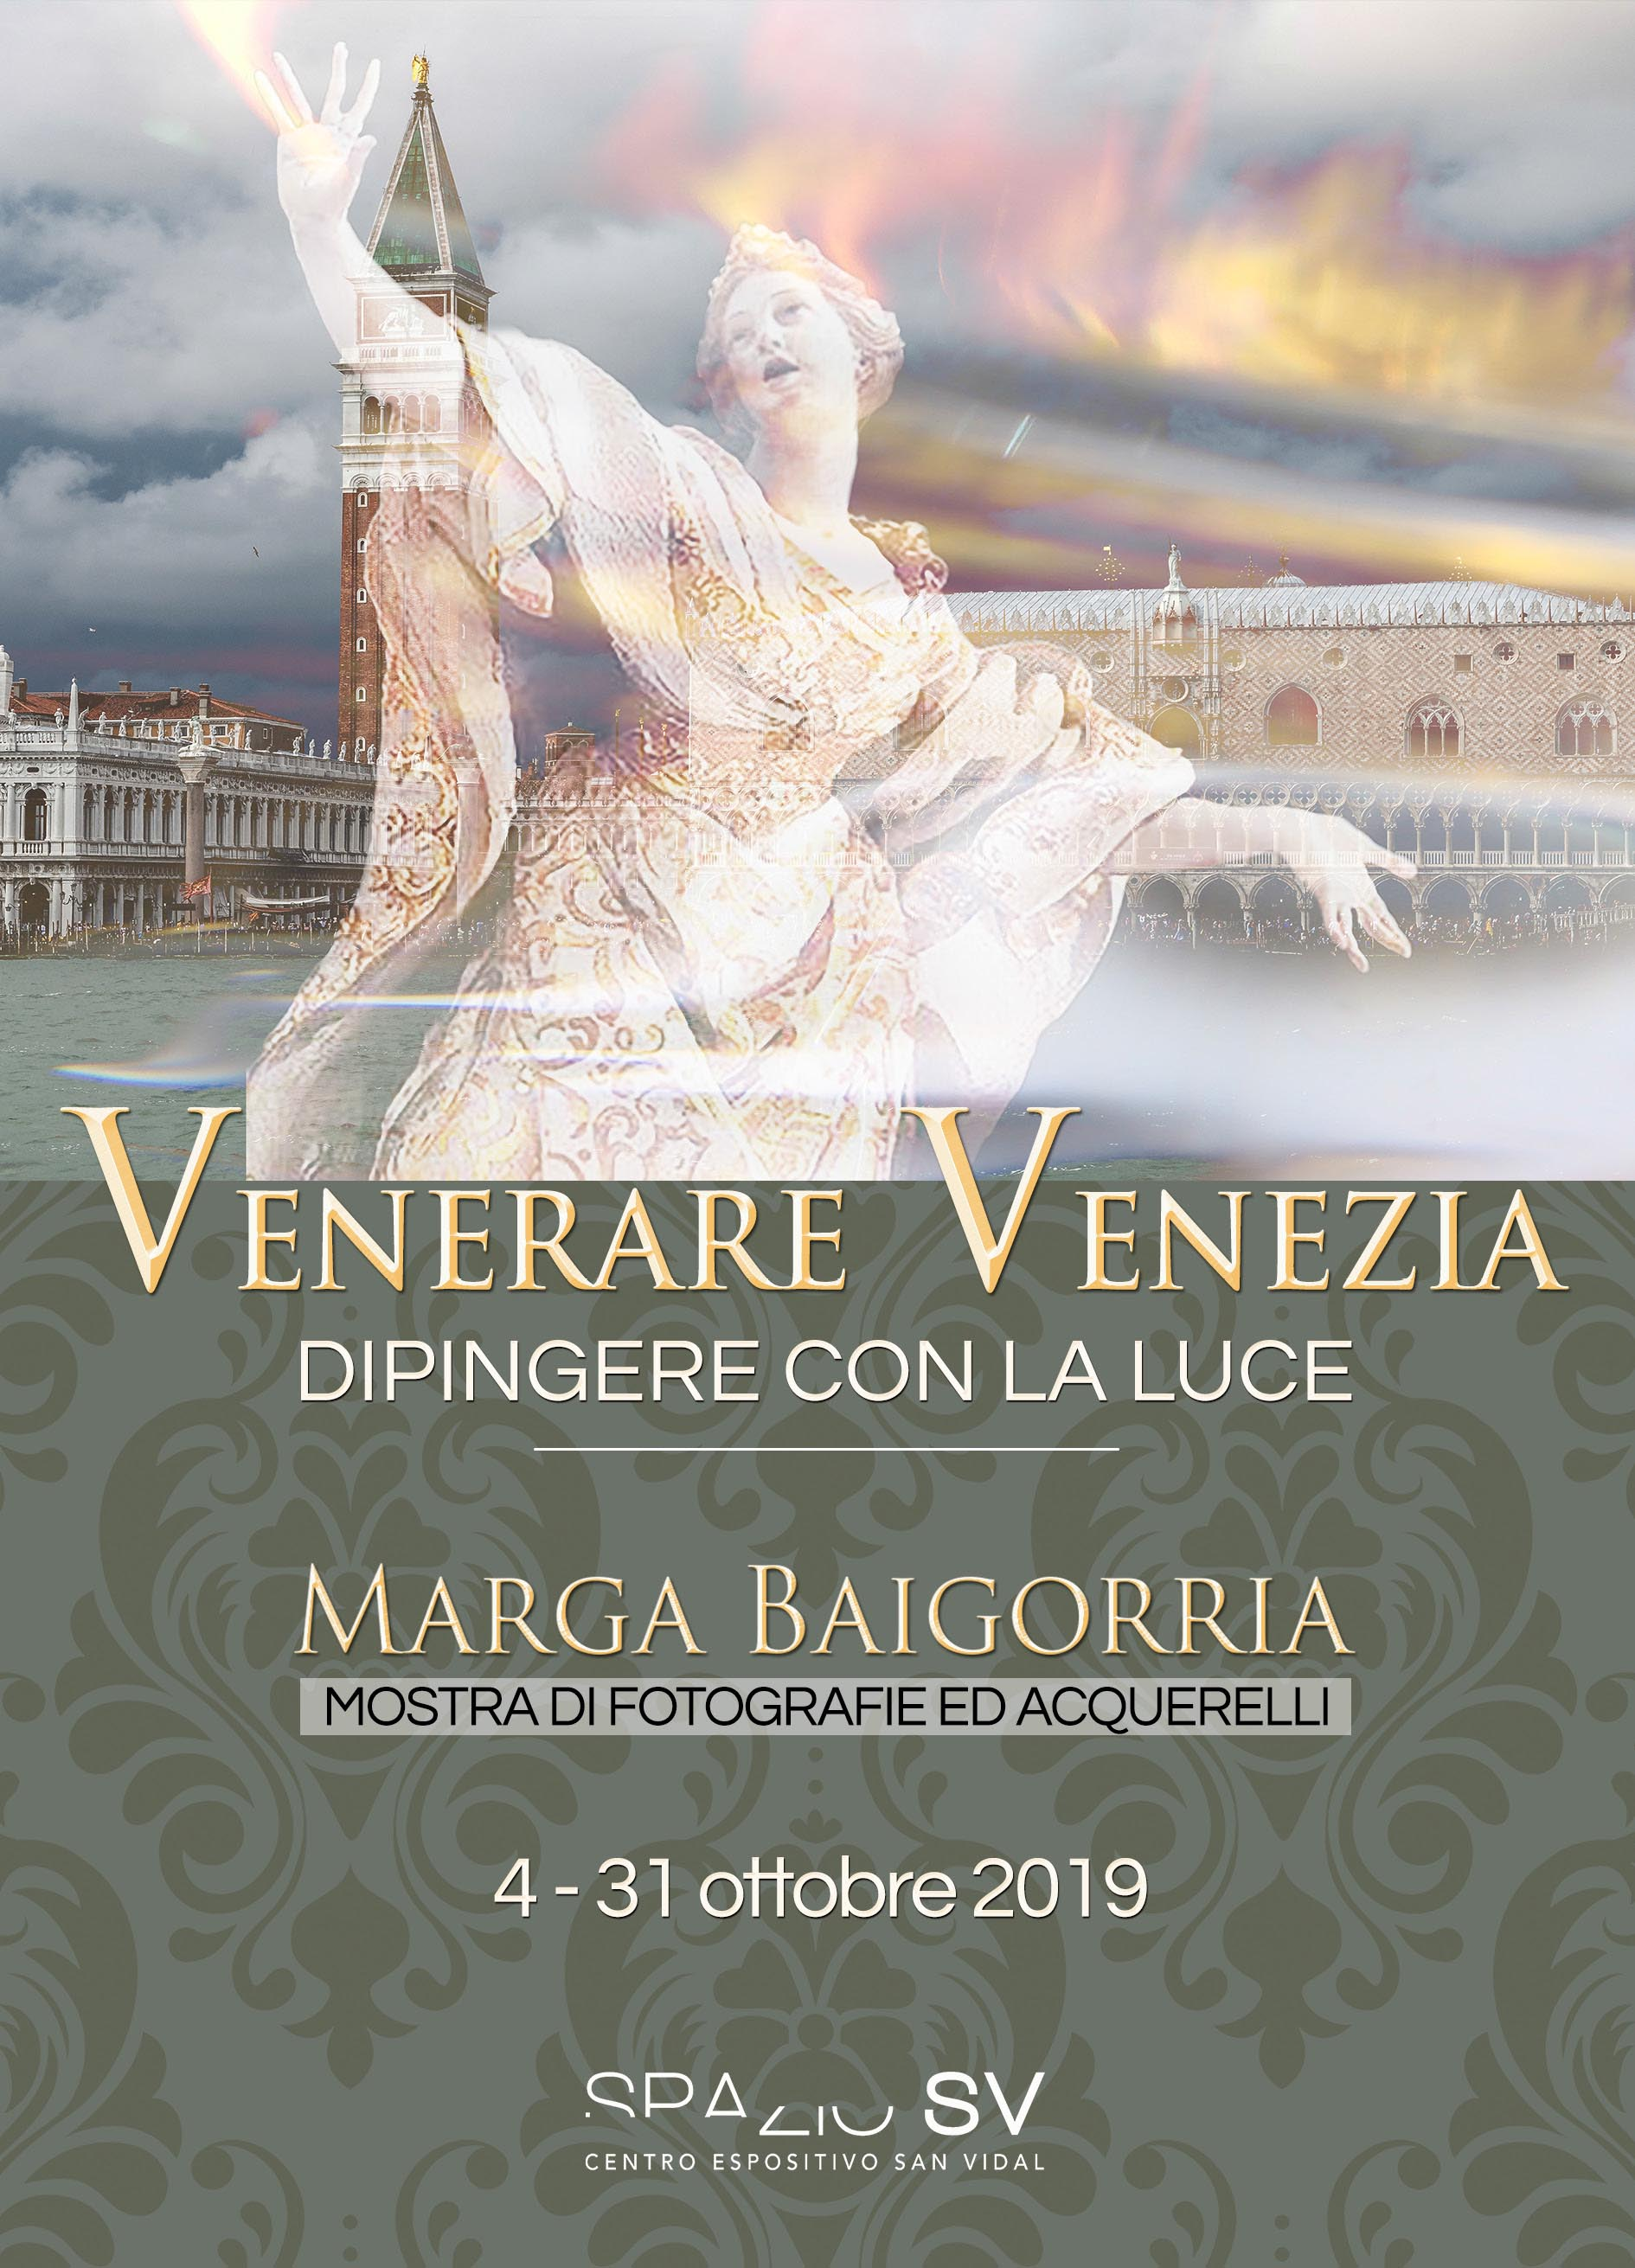 invito-mostra-Marga-Baigorria1